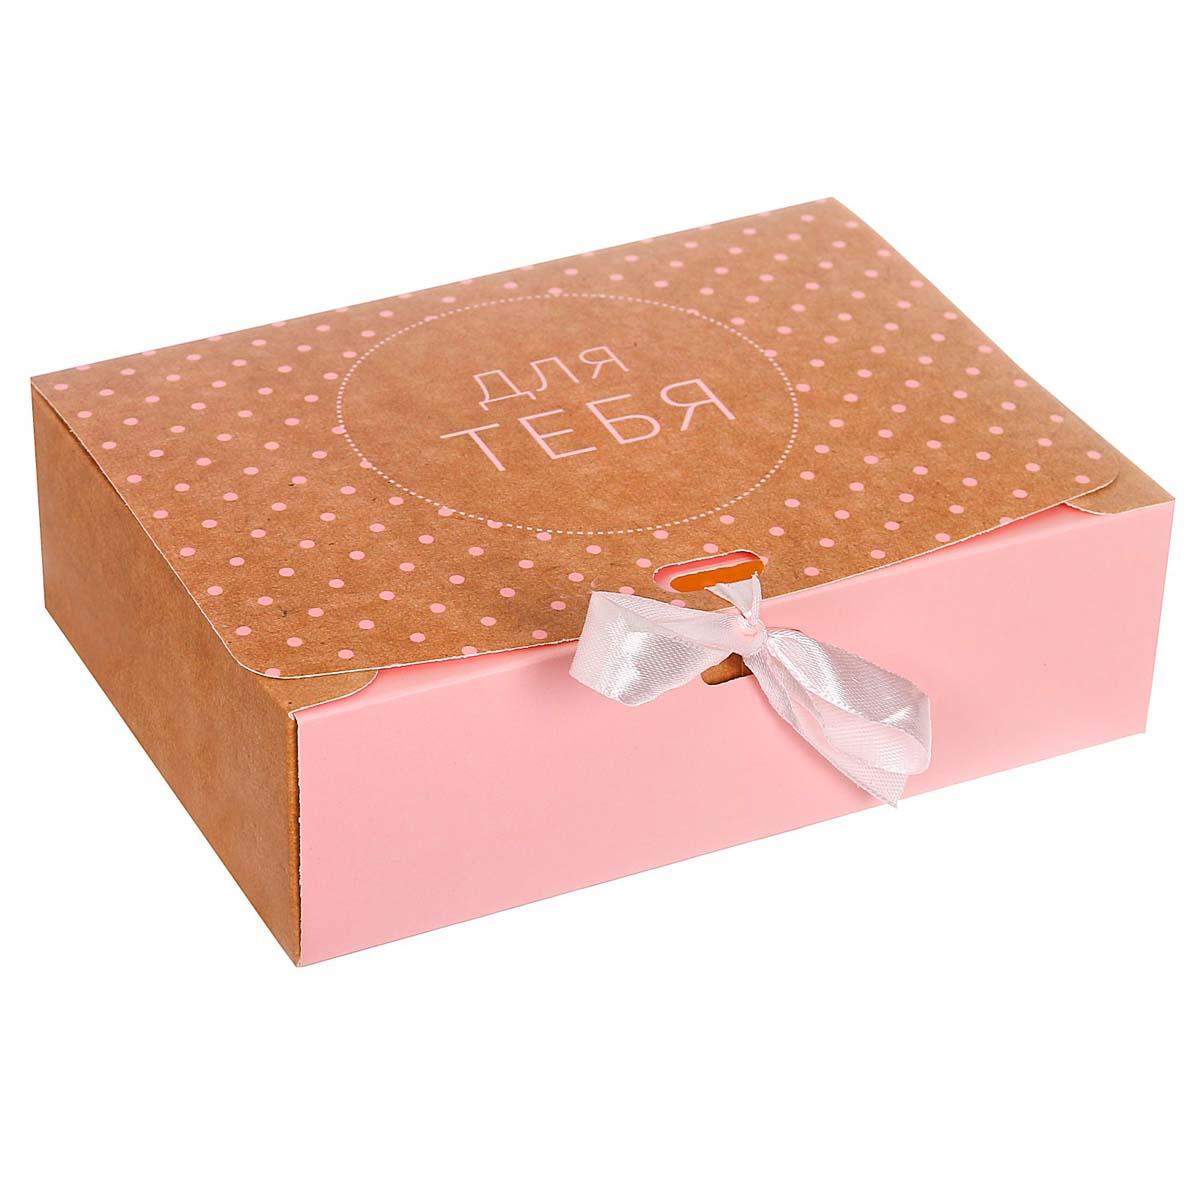 3222445 Коробка подарочная «Для тебя», 31*24,5*9 см